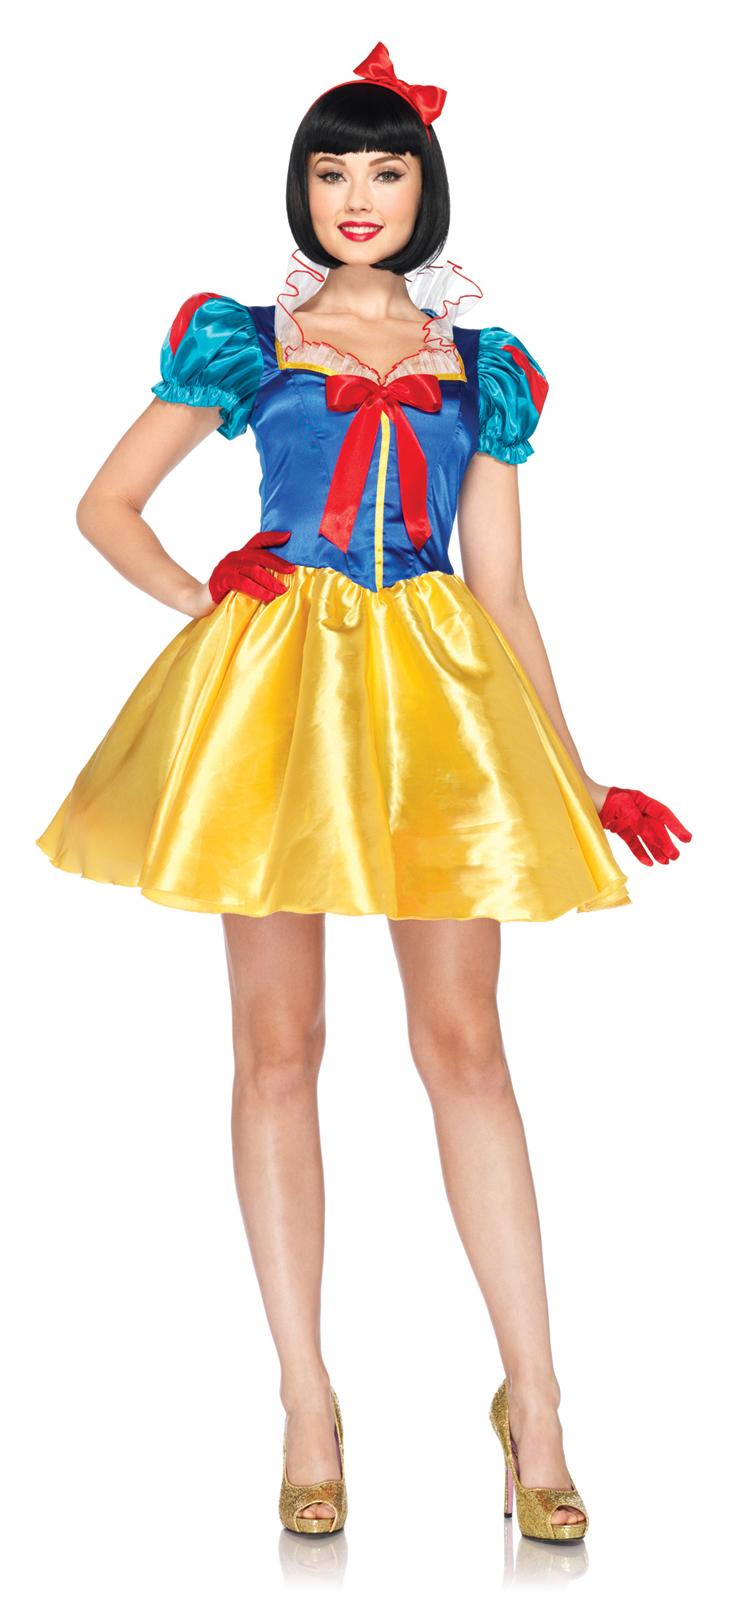 Disney pocahontas halloween costume for adults crack - Costume princesse disney adulte ...